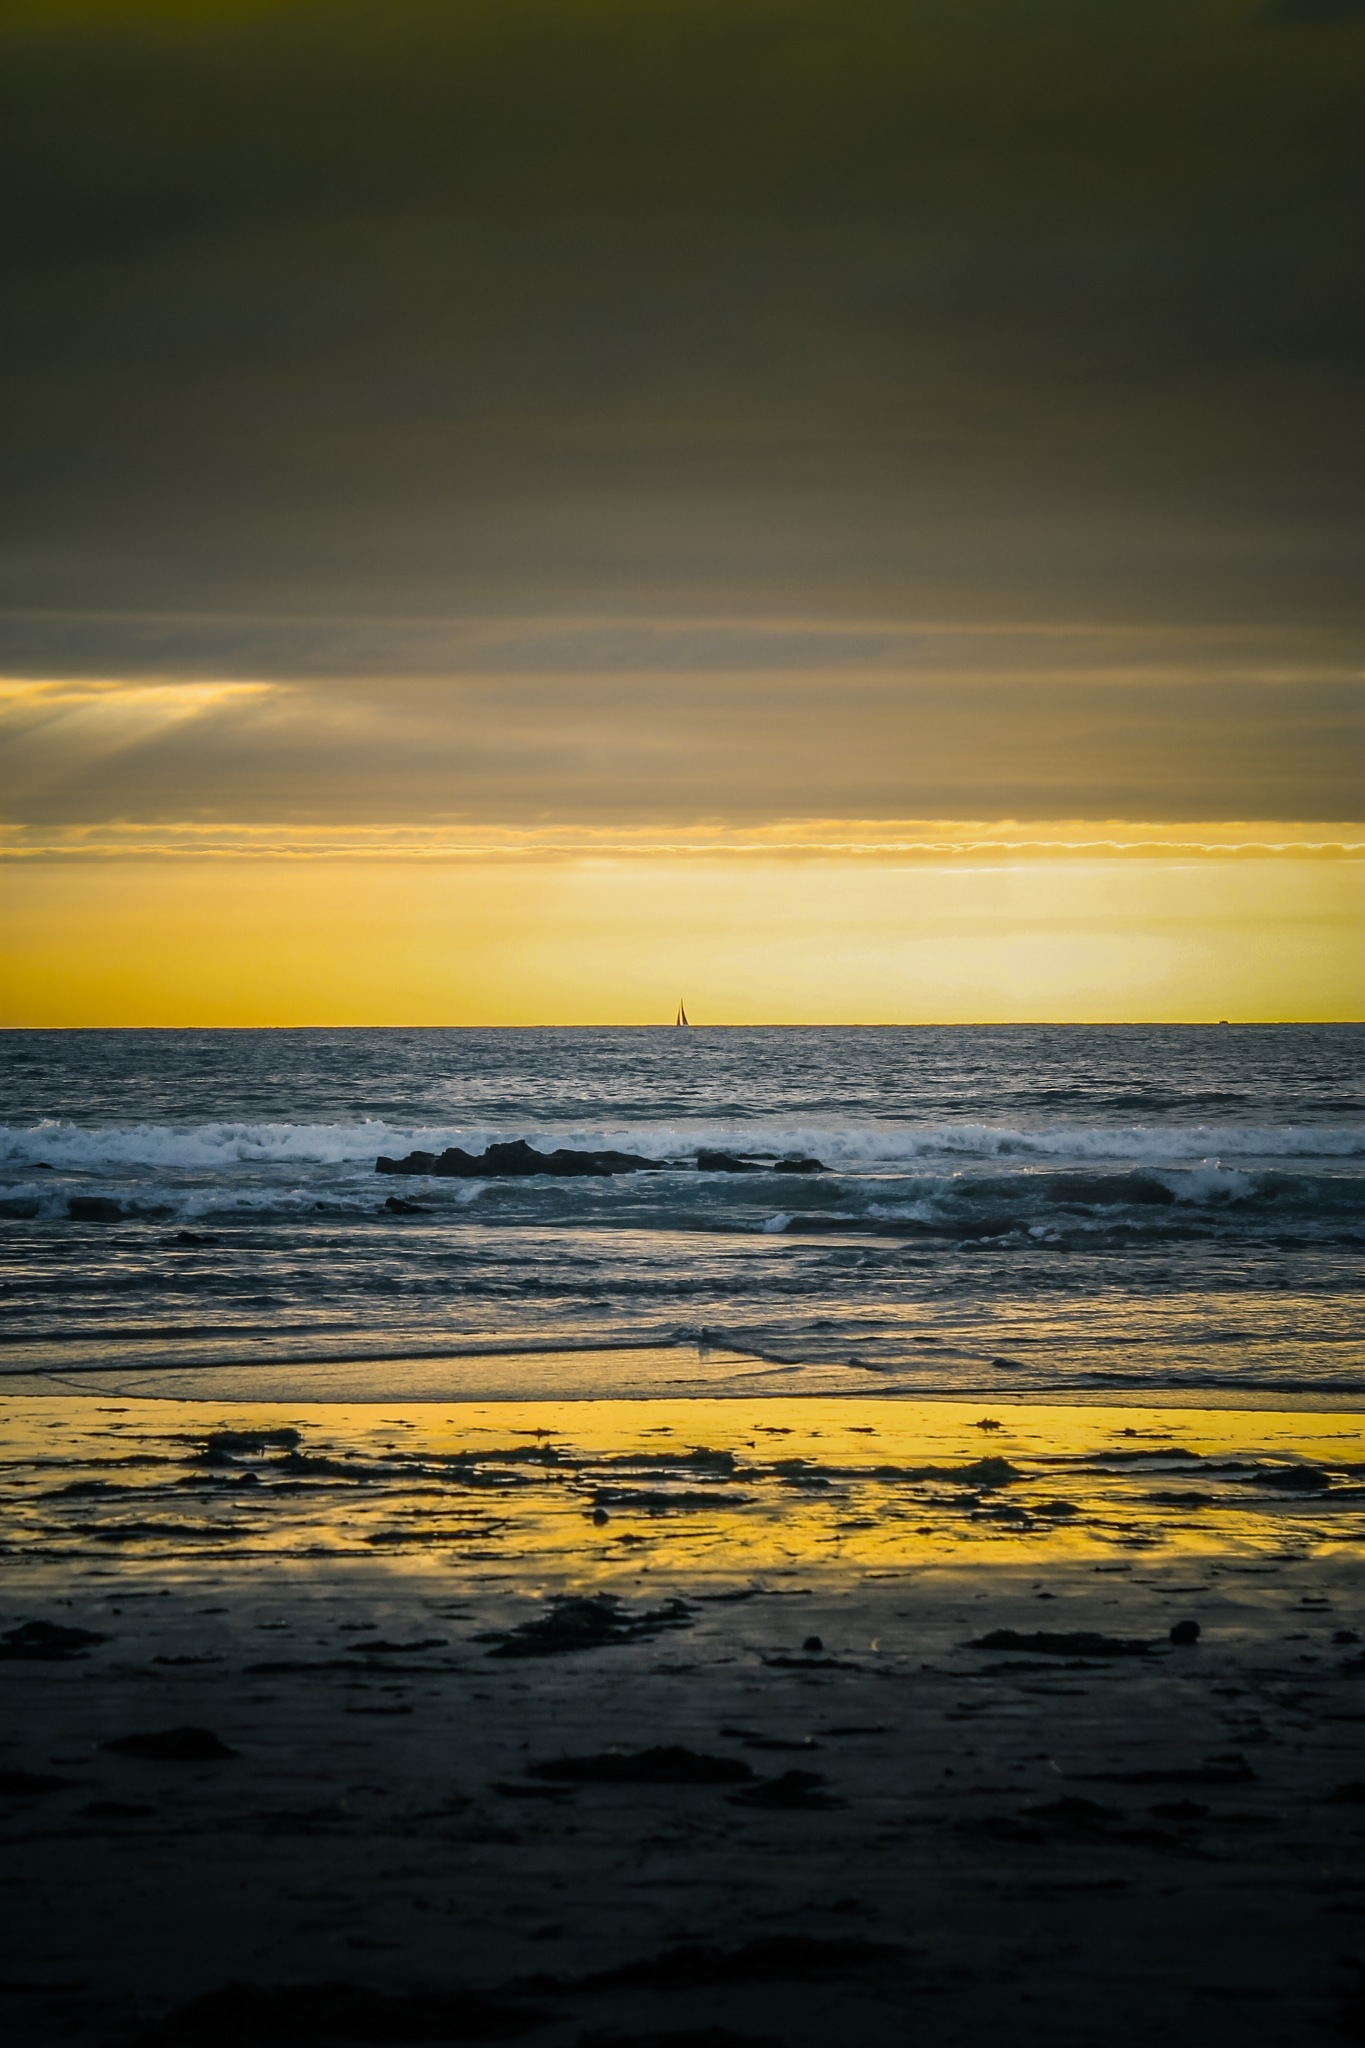 sailing the sunset by dvillanuevas